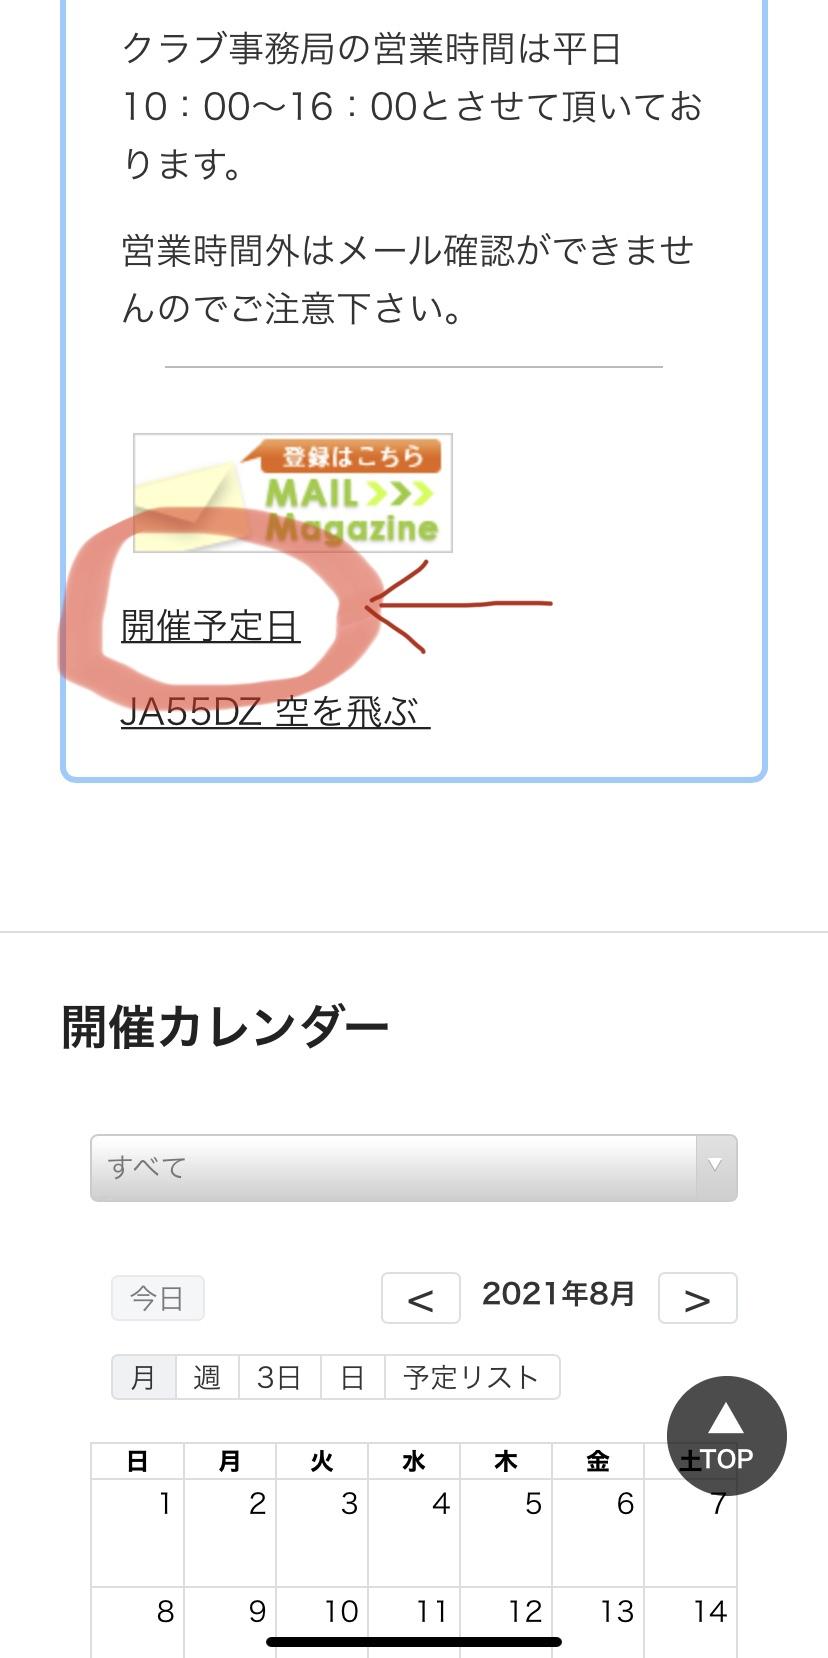 http://tokyoskydivingclub.jp/tool/callender_t.php